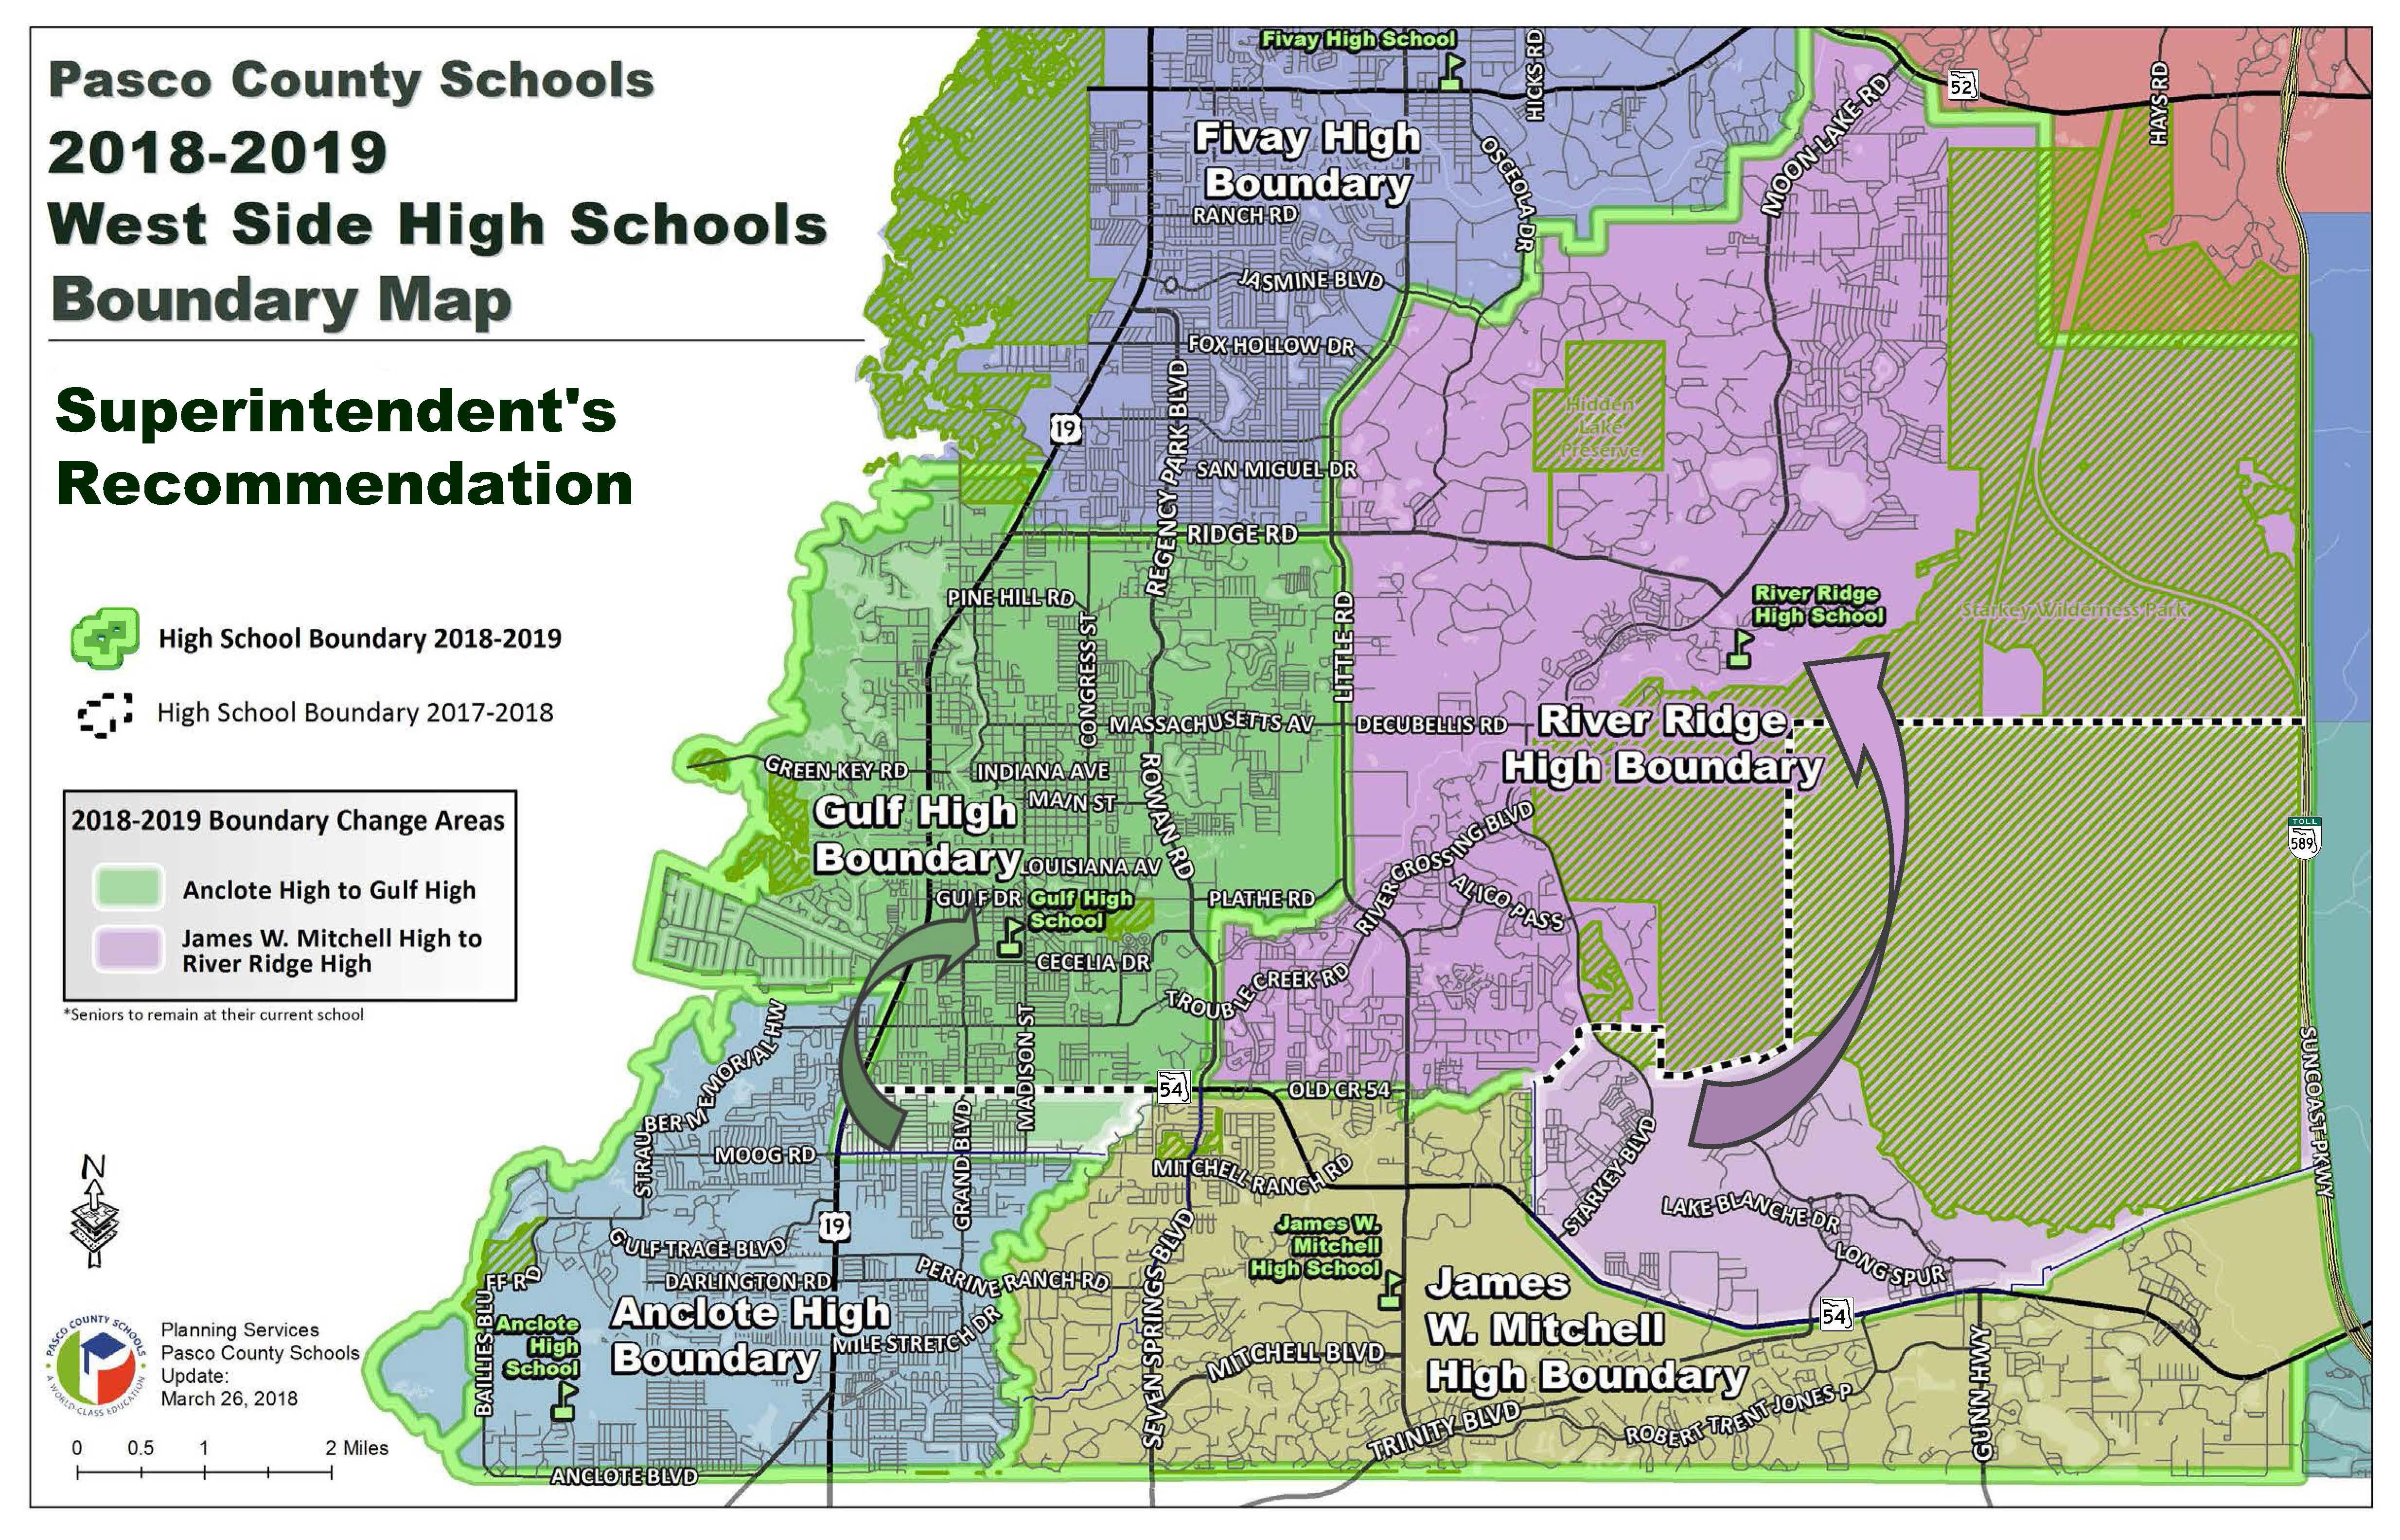 Pasco County Schools - Sexual Predator Map Florida